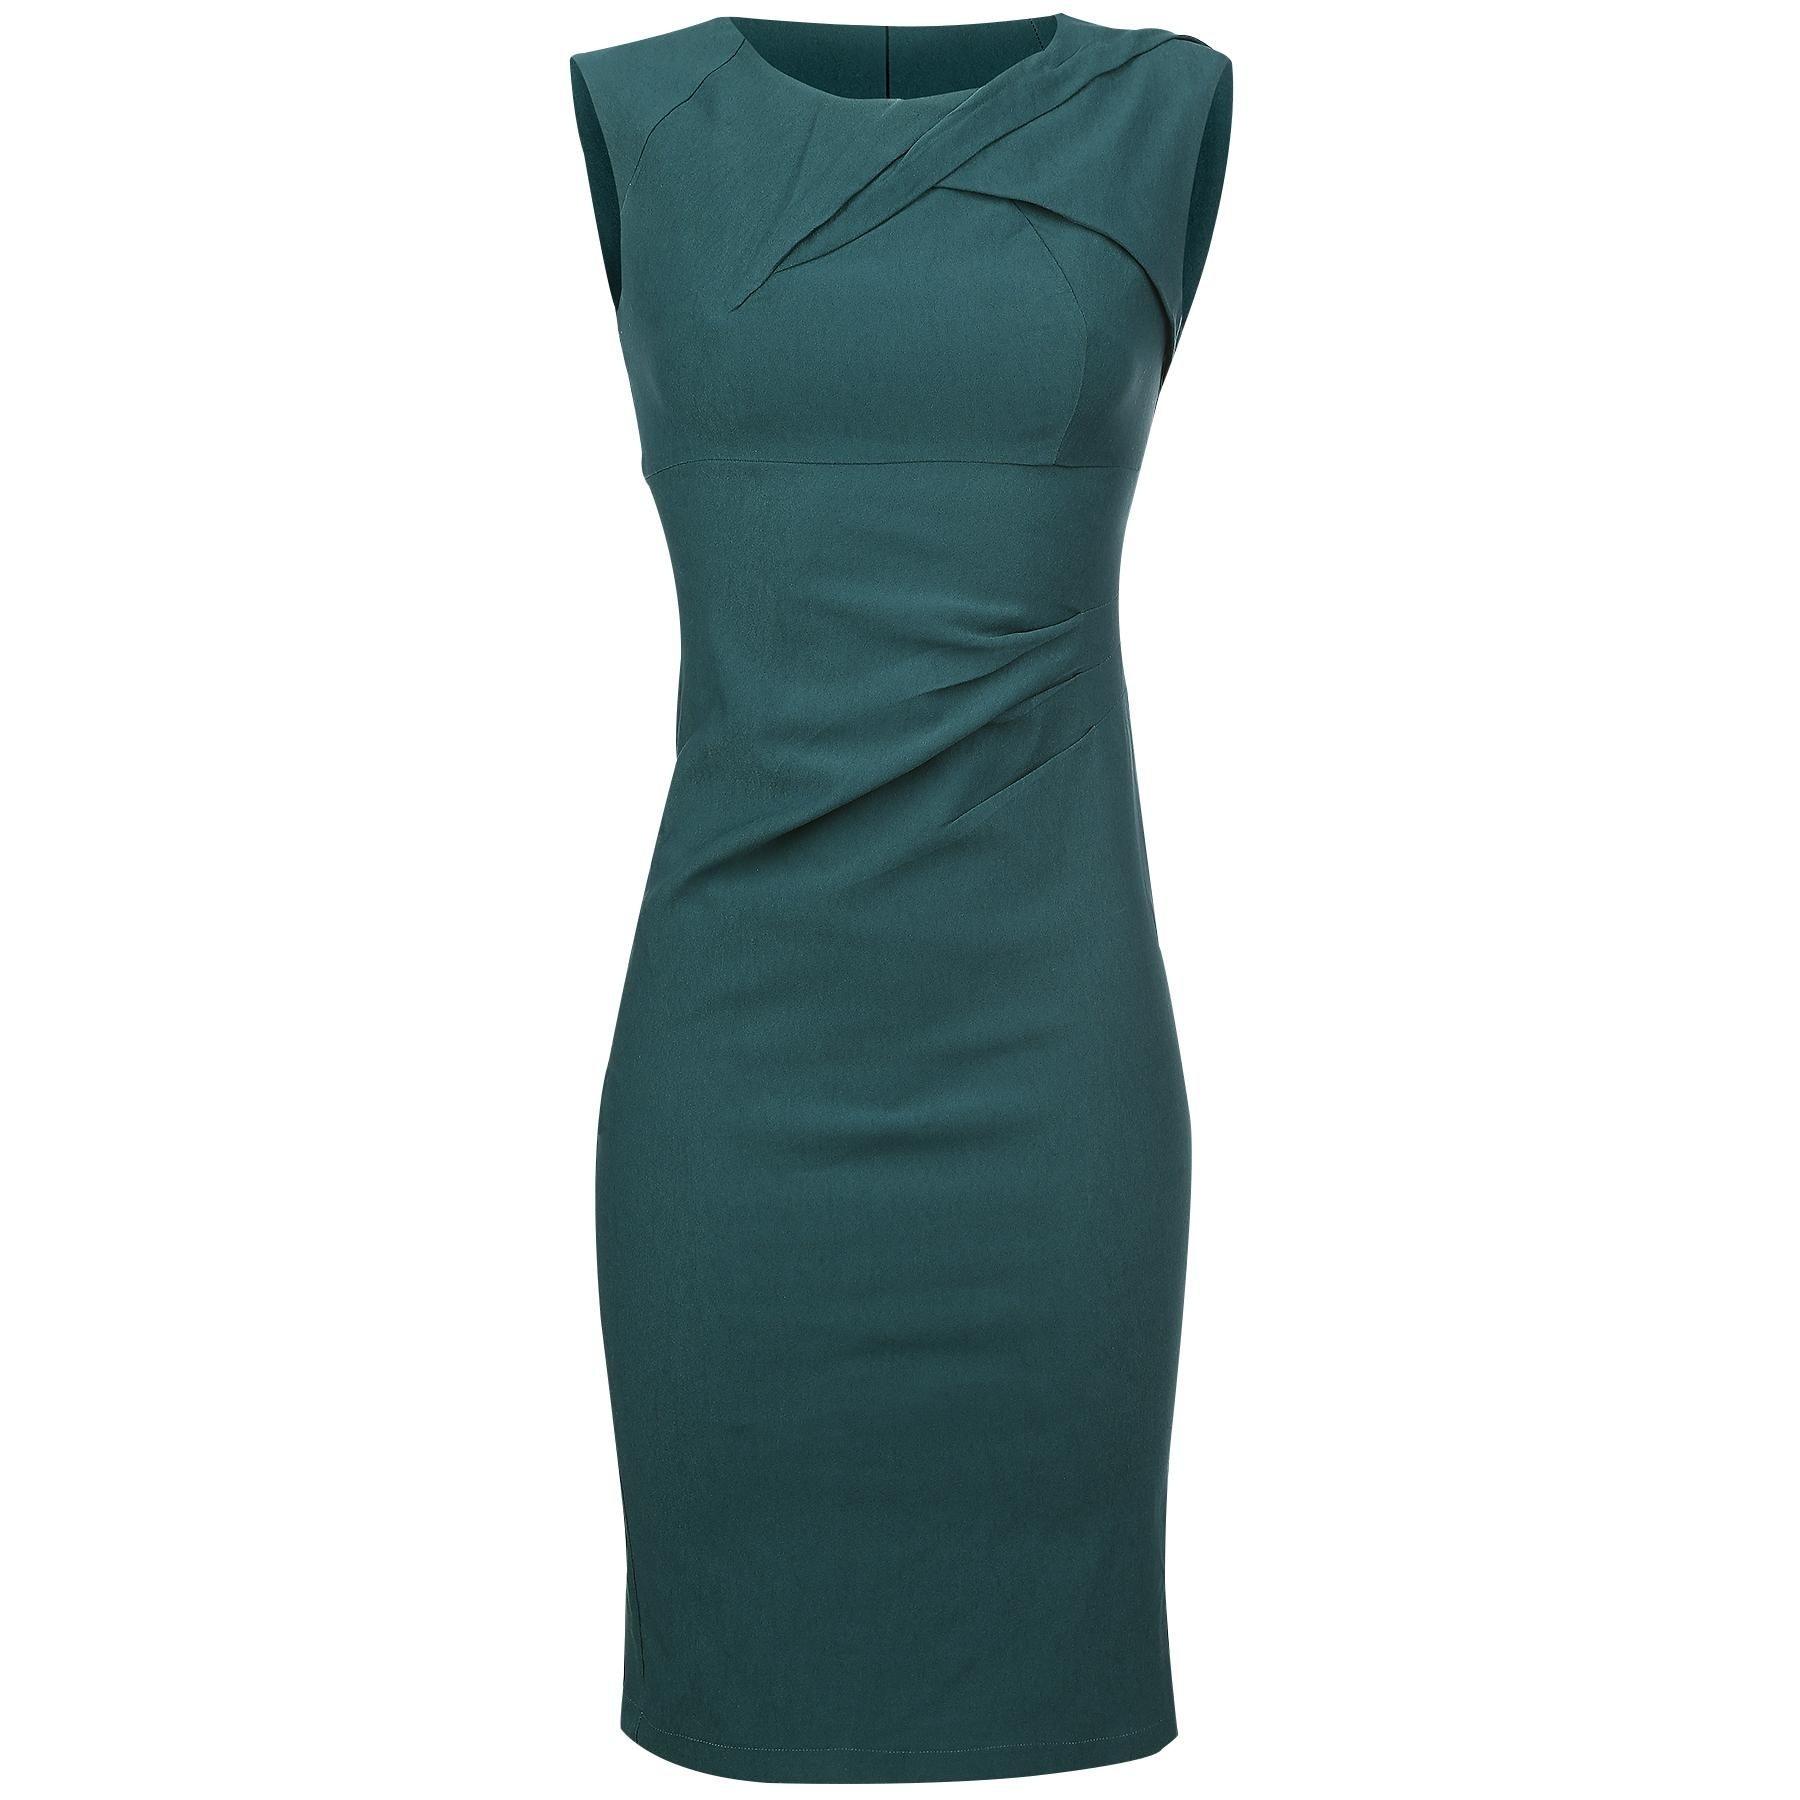 Formal Cool Abendkleider Mittellang Günstig Galerie15 Erstaunlich Abendkleider Mittellang Günstig Design